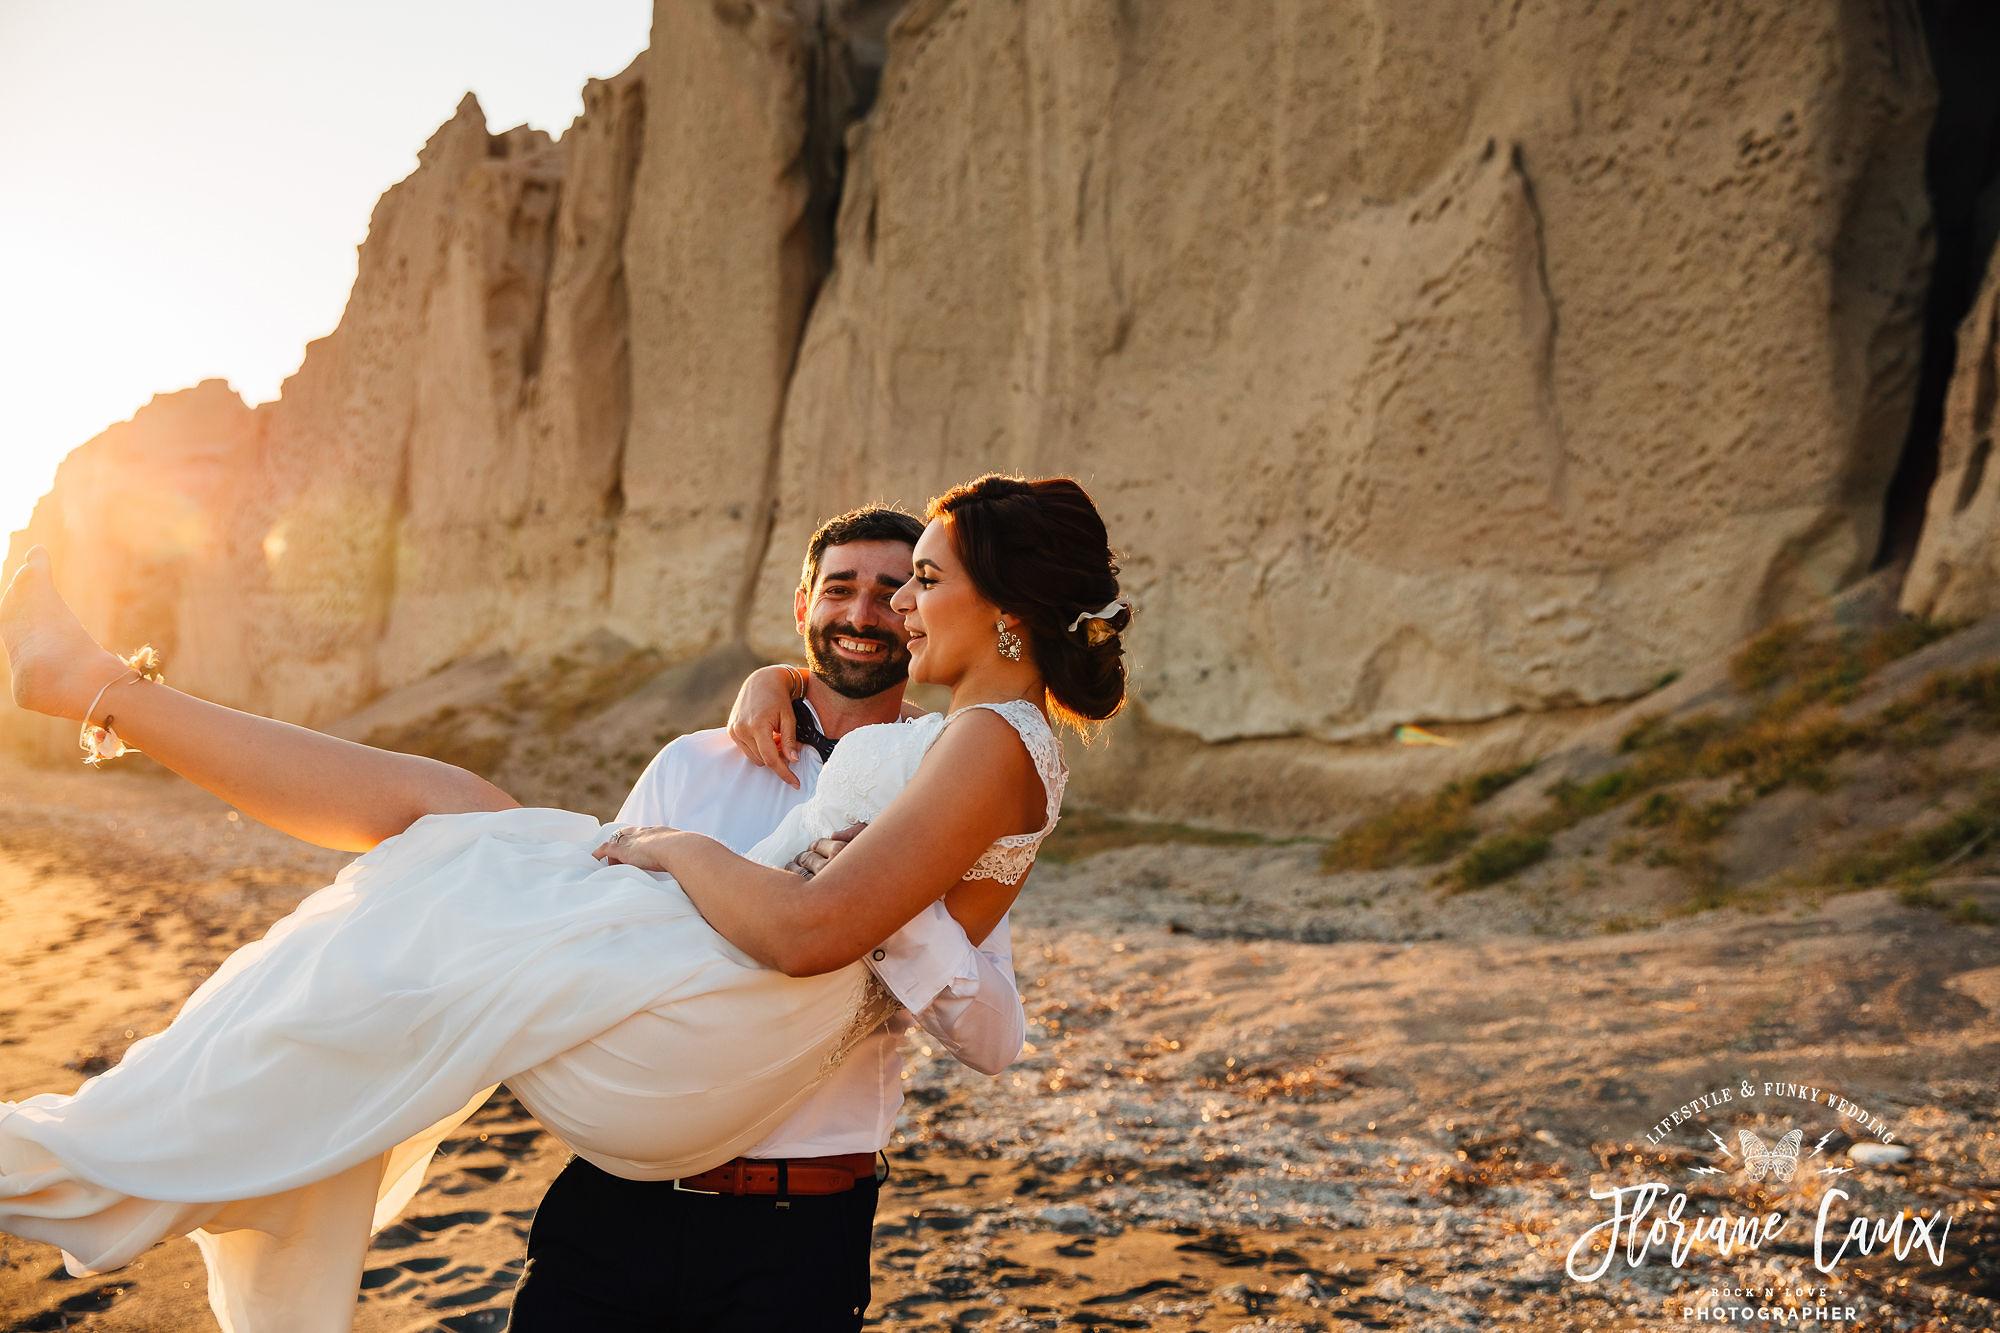 Wedding-planner-Toulouse+Floriane-CAUX-Mariage-Santorin(25)